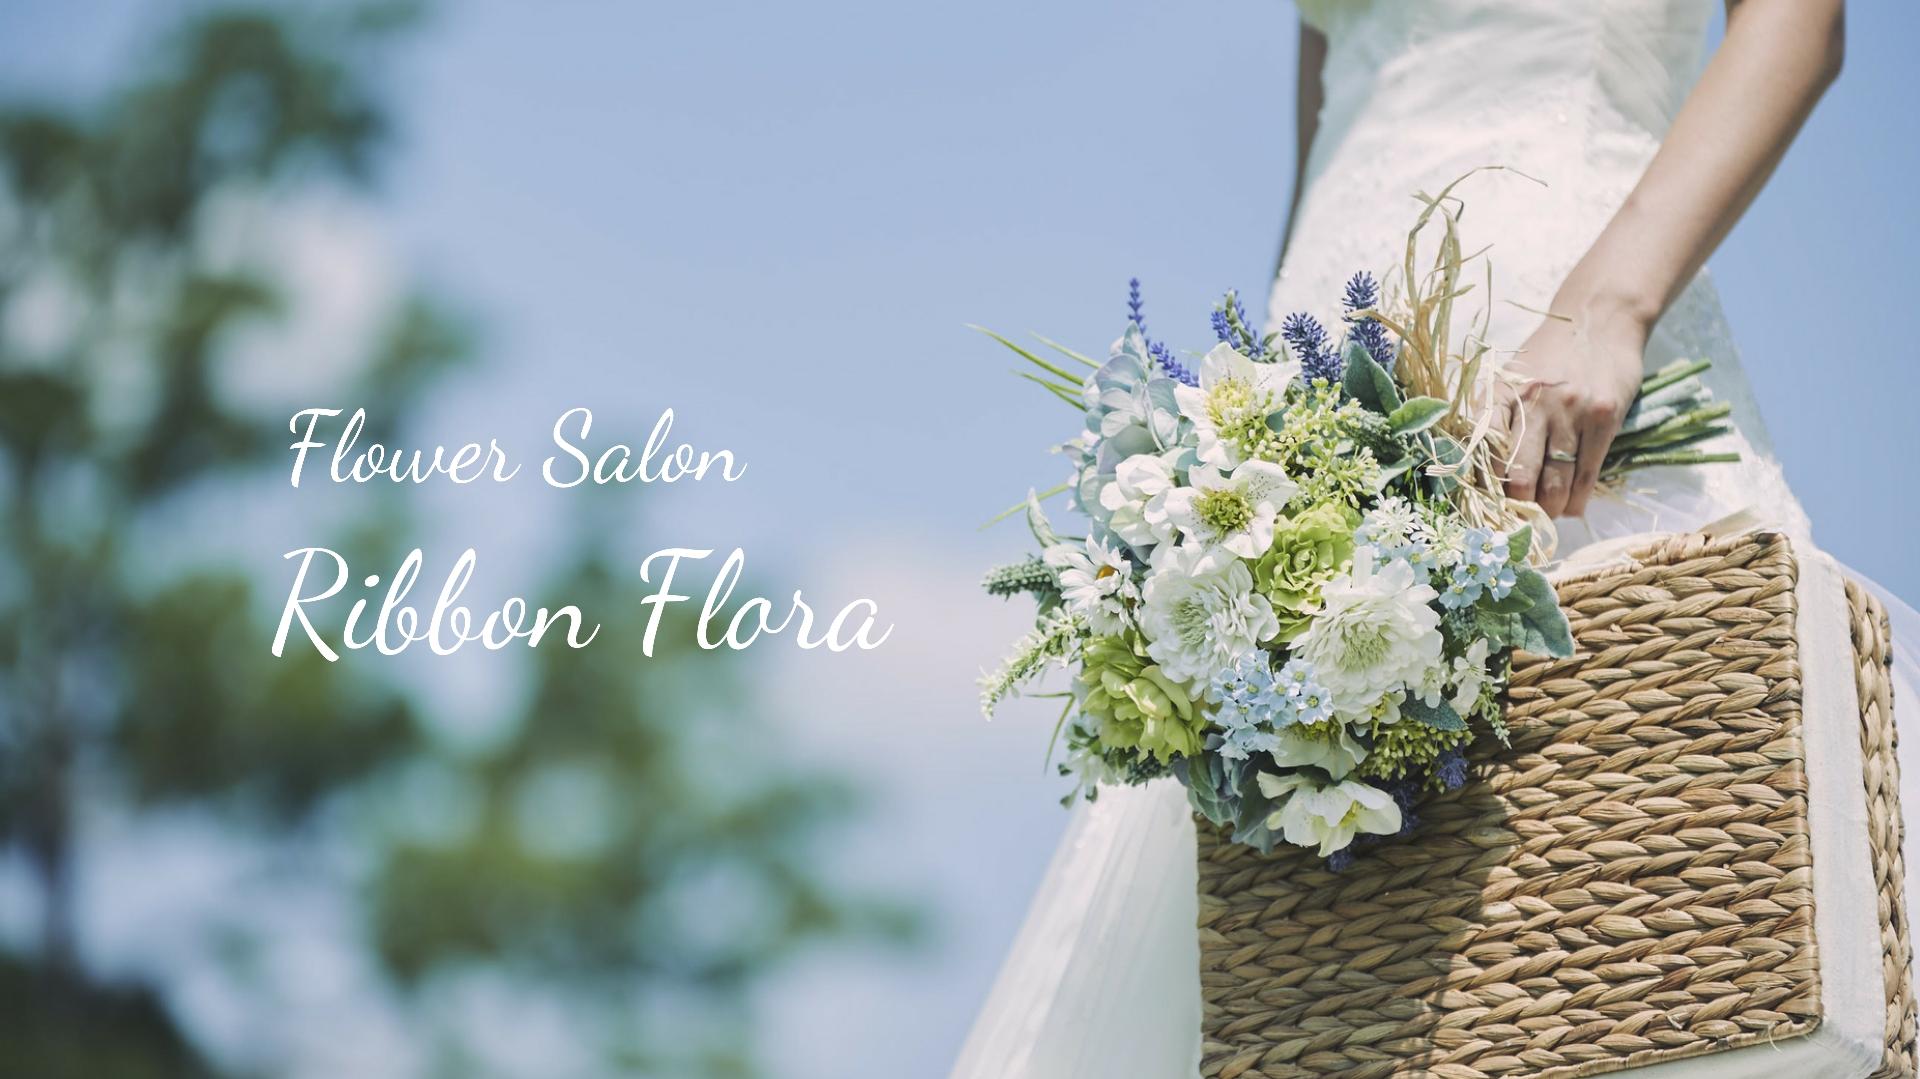 Ribbon Flora